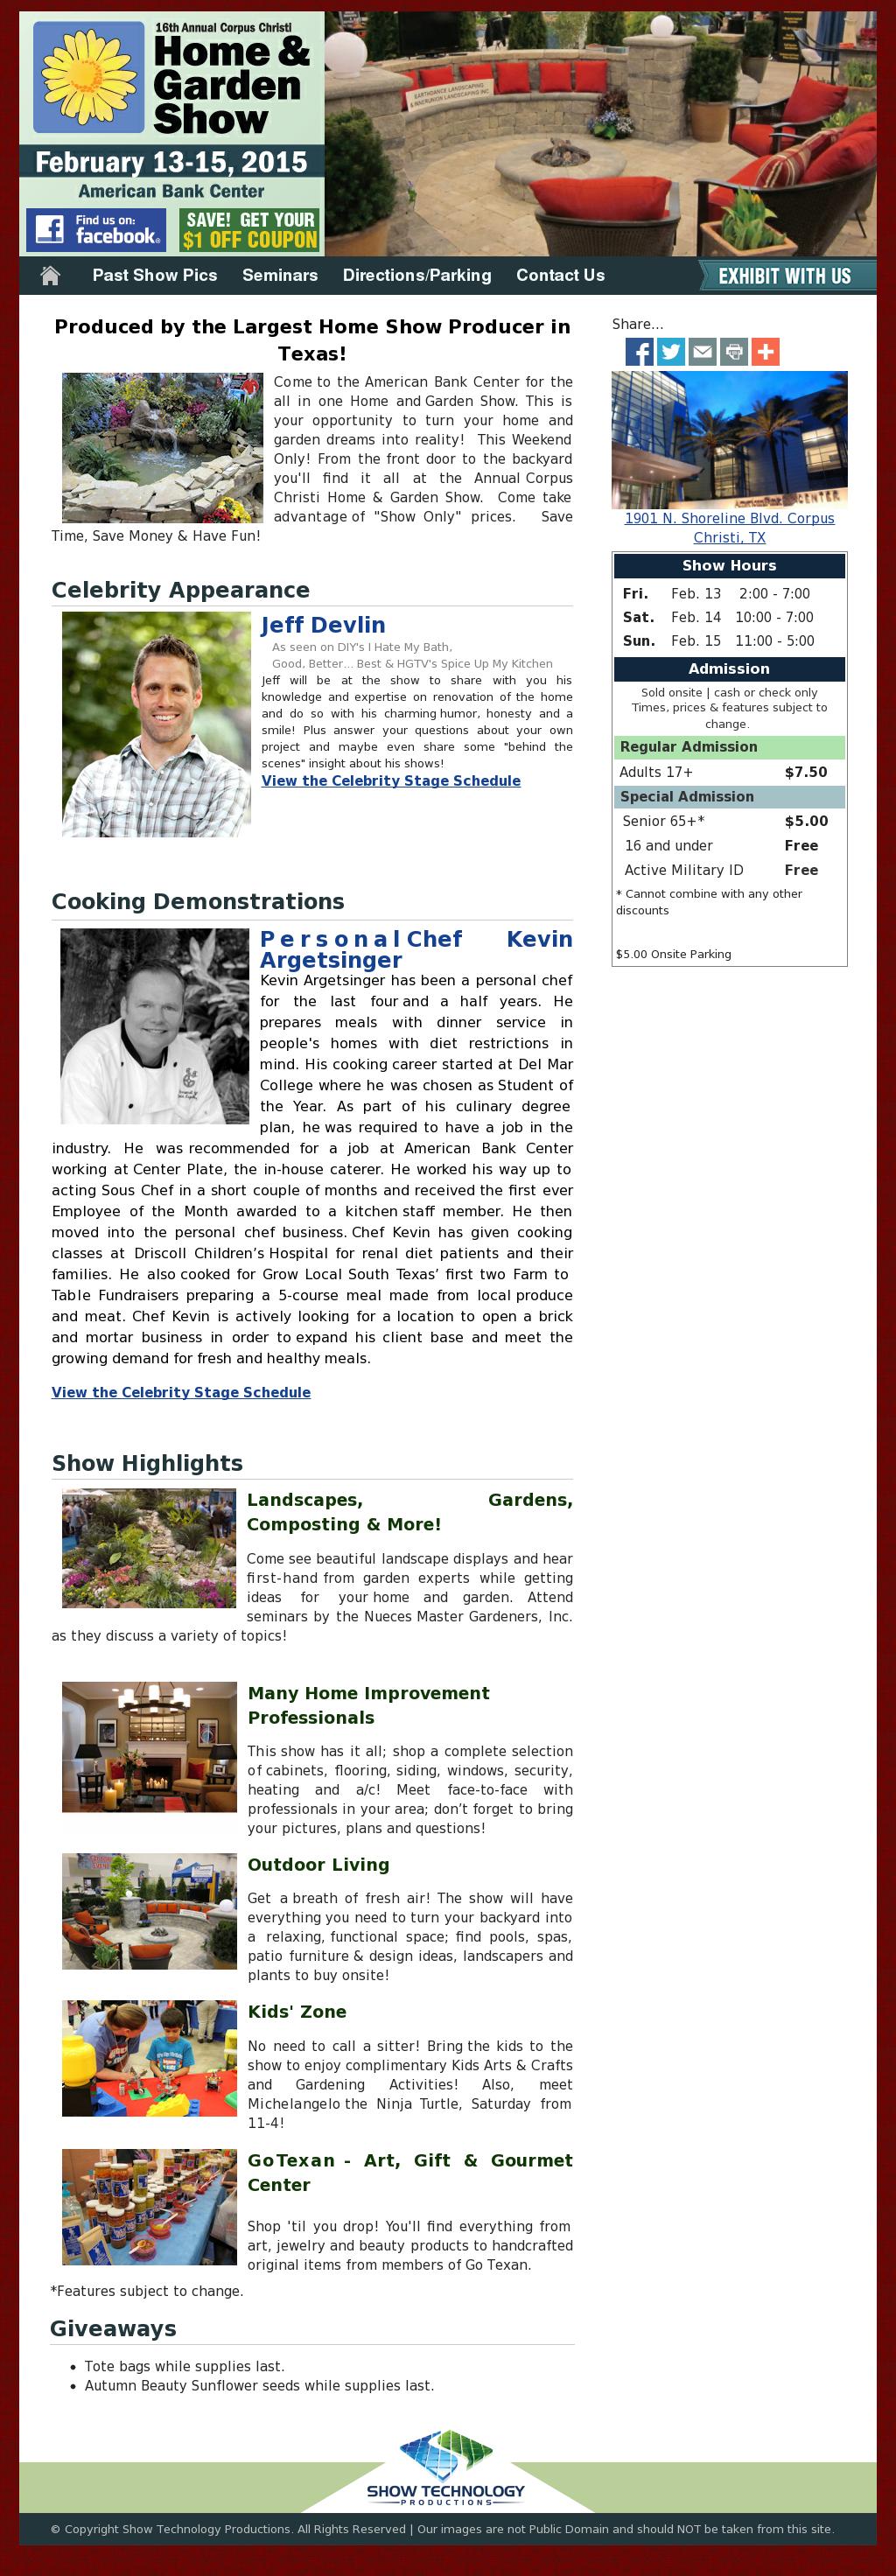 Corpus Christi Spring/fall Home U0026 Garden Show Competitors, Revenue And  Employees   Owler Company Profile